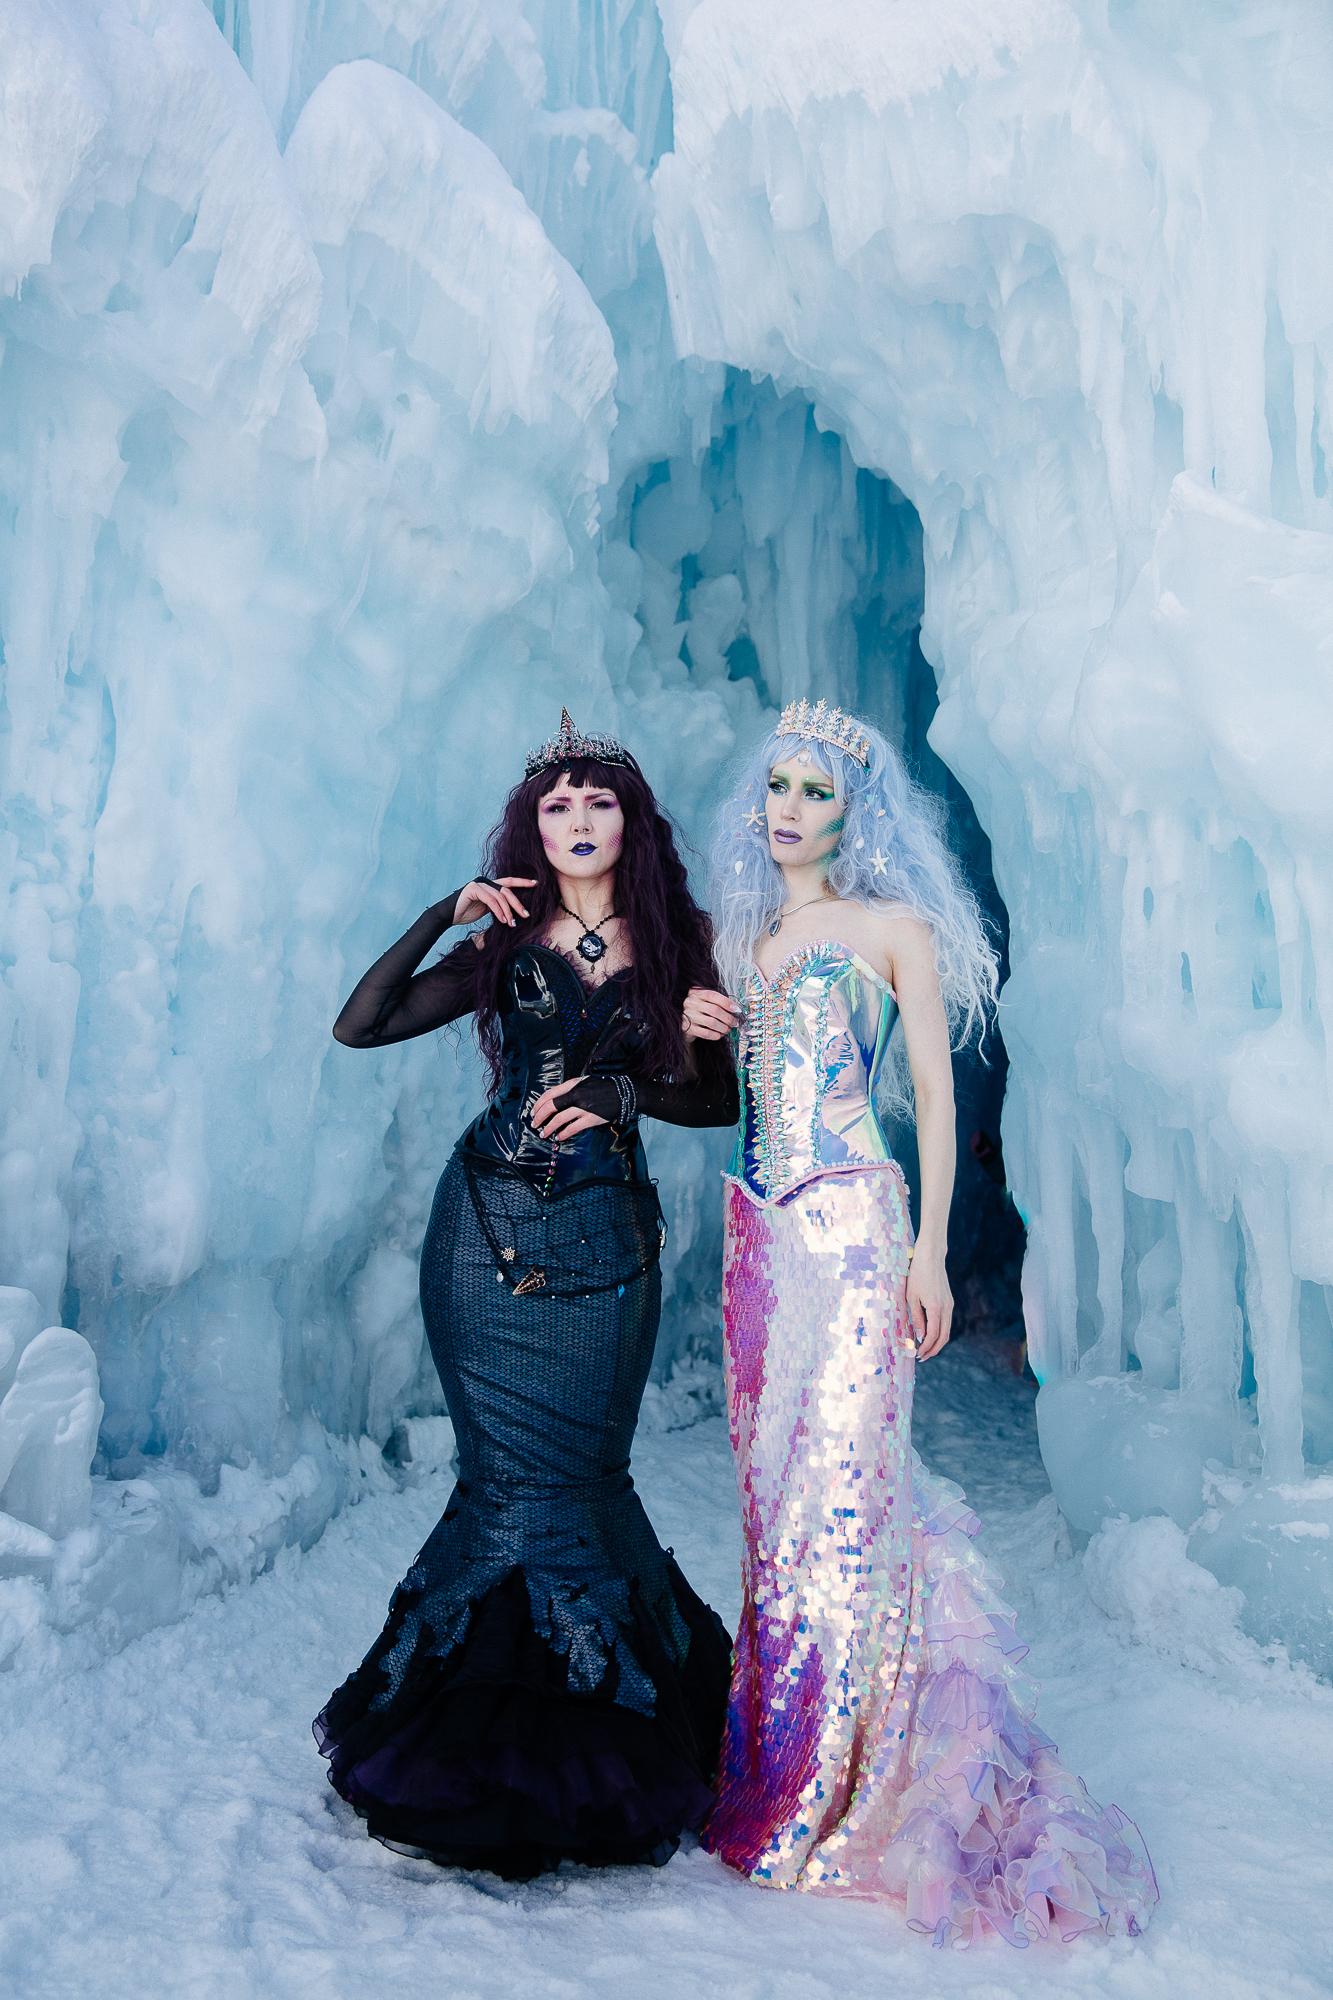 Jen_Montgomery_Photography_KMK_Ice_Mermaids_REEDITS_FB-13.jpg